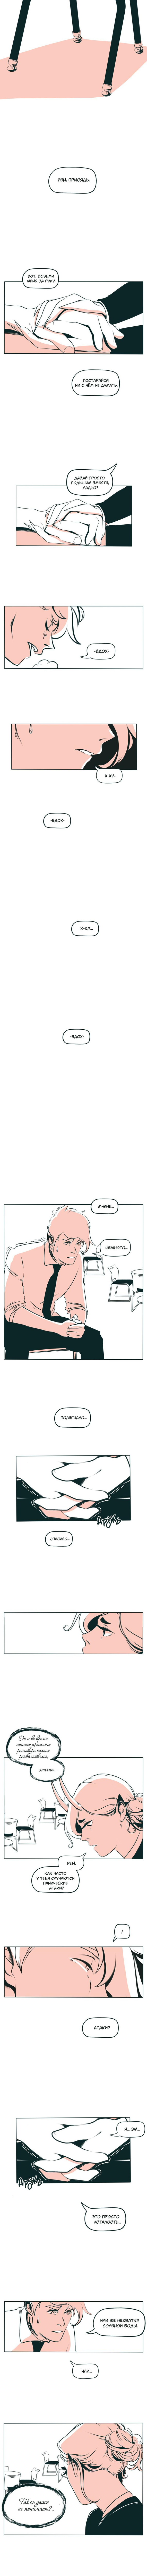 https://r1.ninemanga.com/comics/pic2/0/33536/426157/1534978591142.jpg Page 1